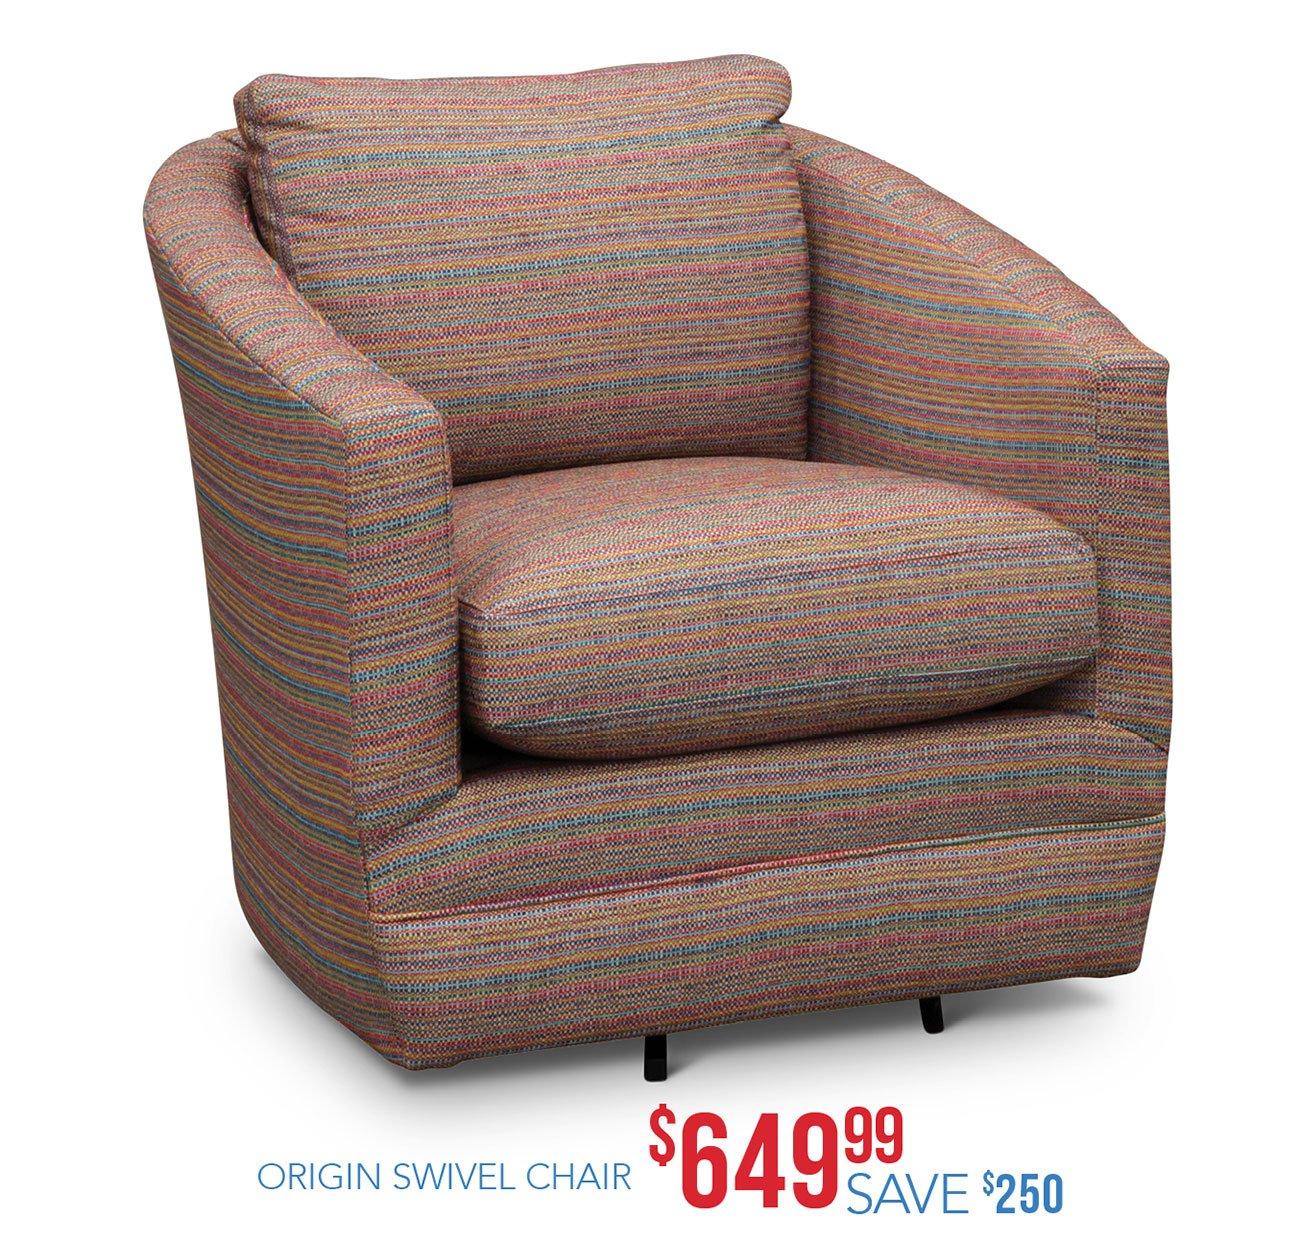 Origin-swivel-chair